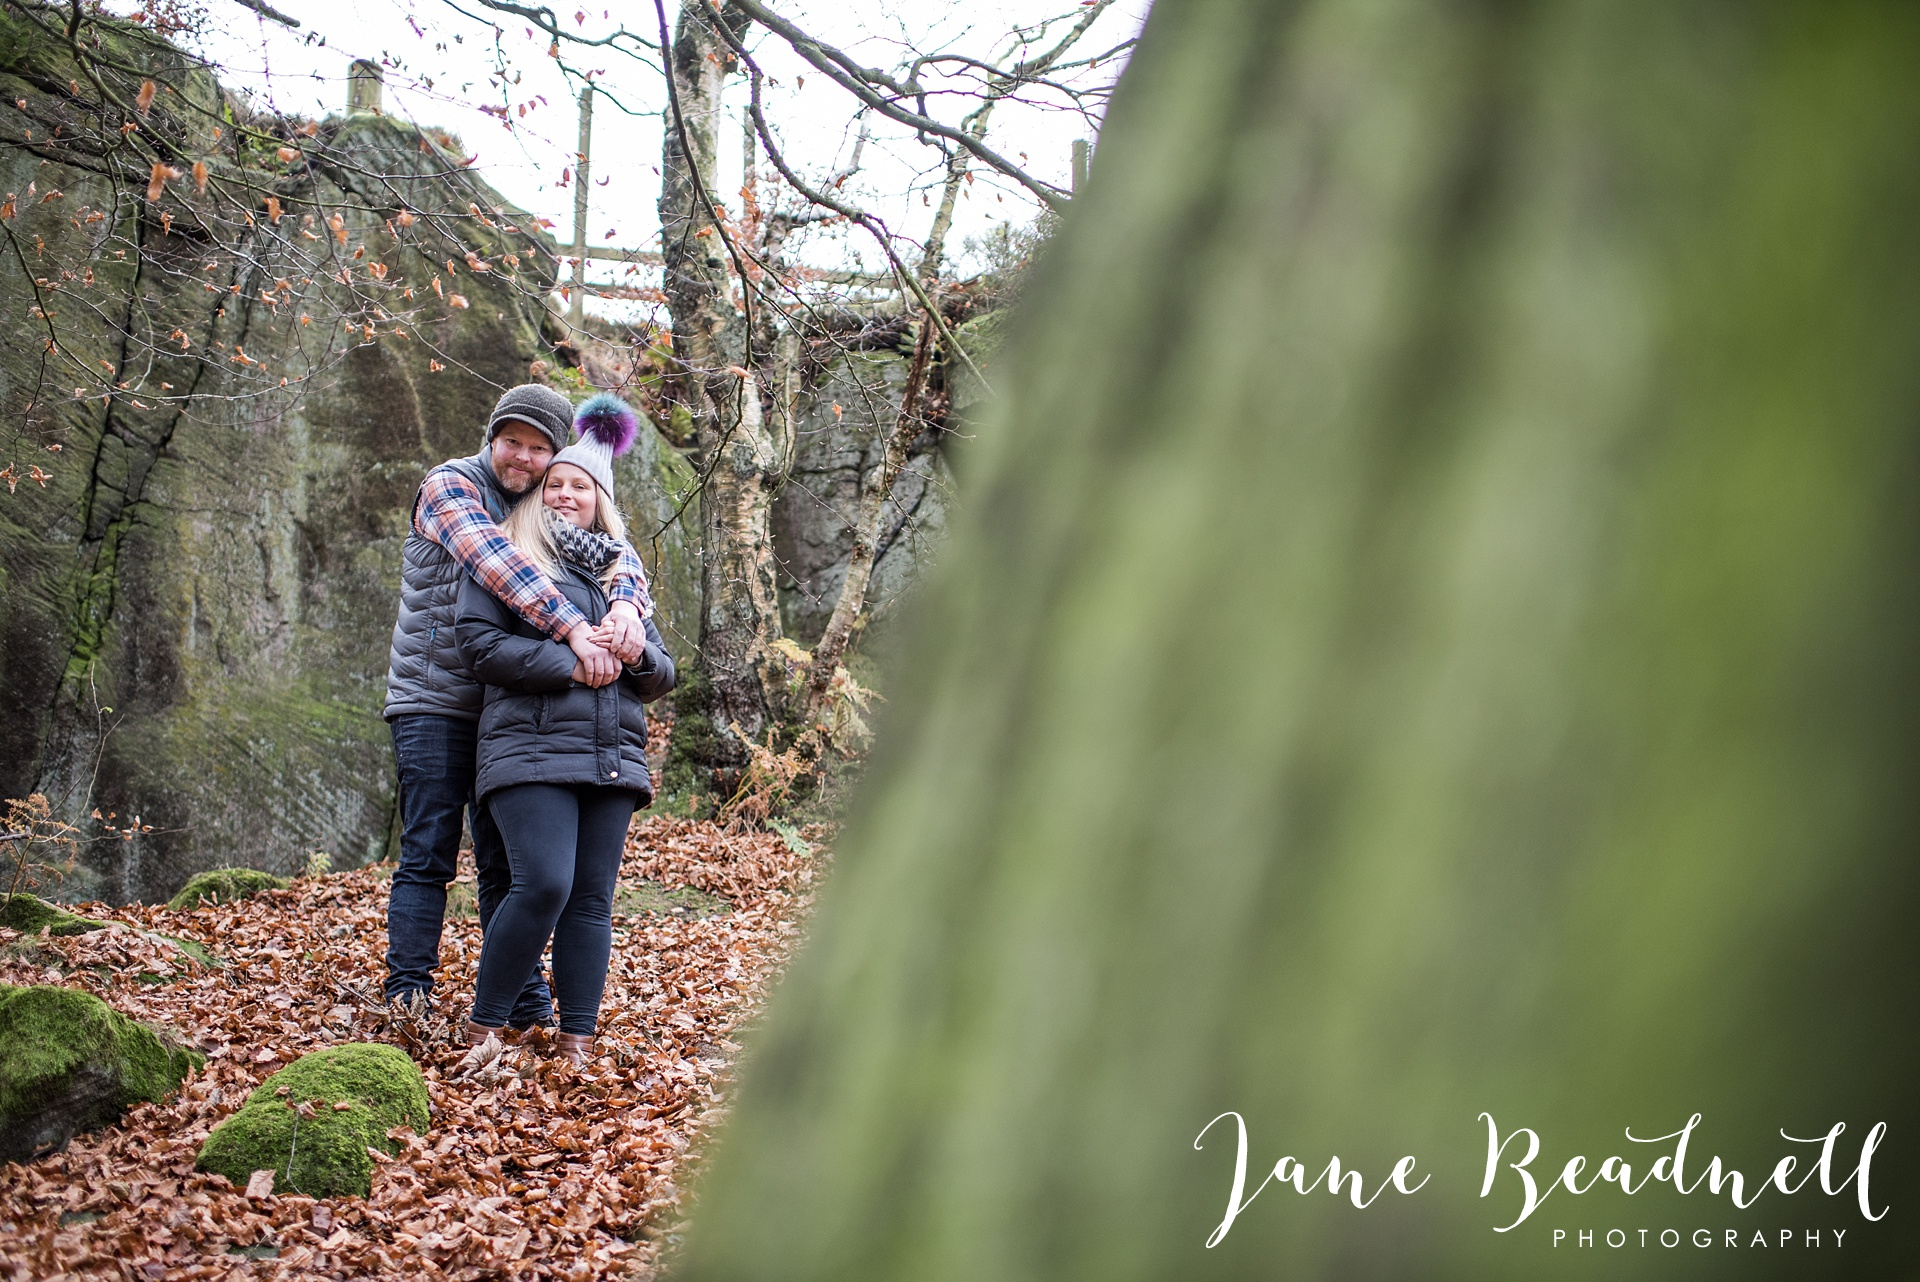 yorkshire-wedding-photographer-jane-beadnell-photography-uk-and-destination-wedding-photographer-engagement-shoot_0060